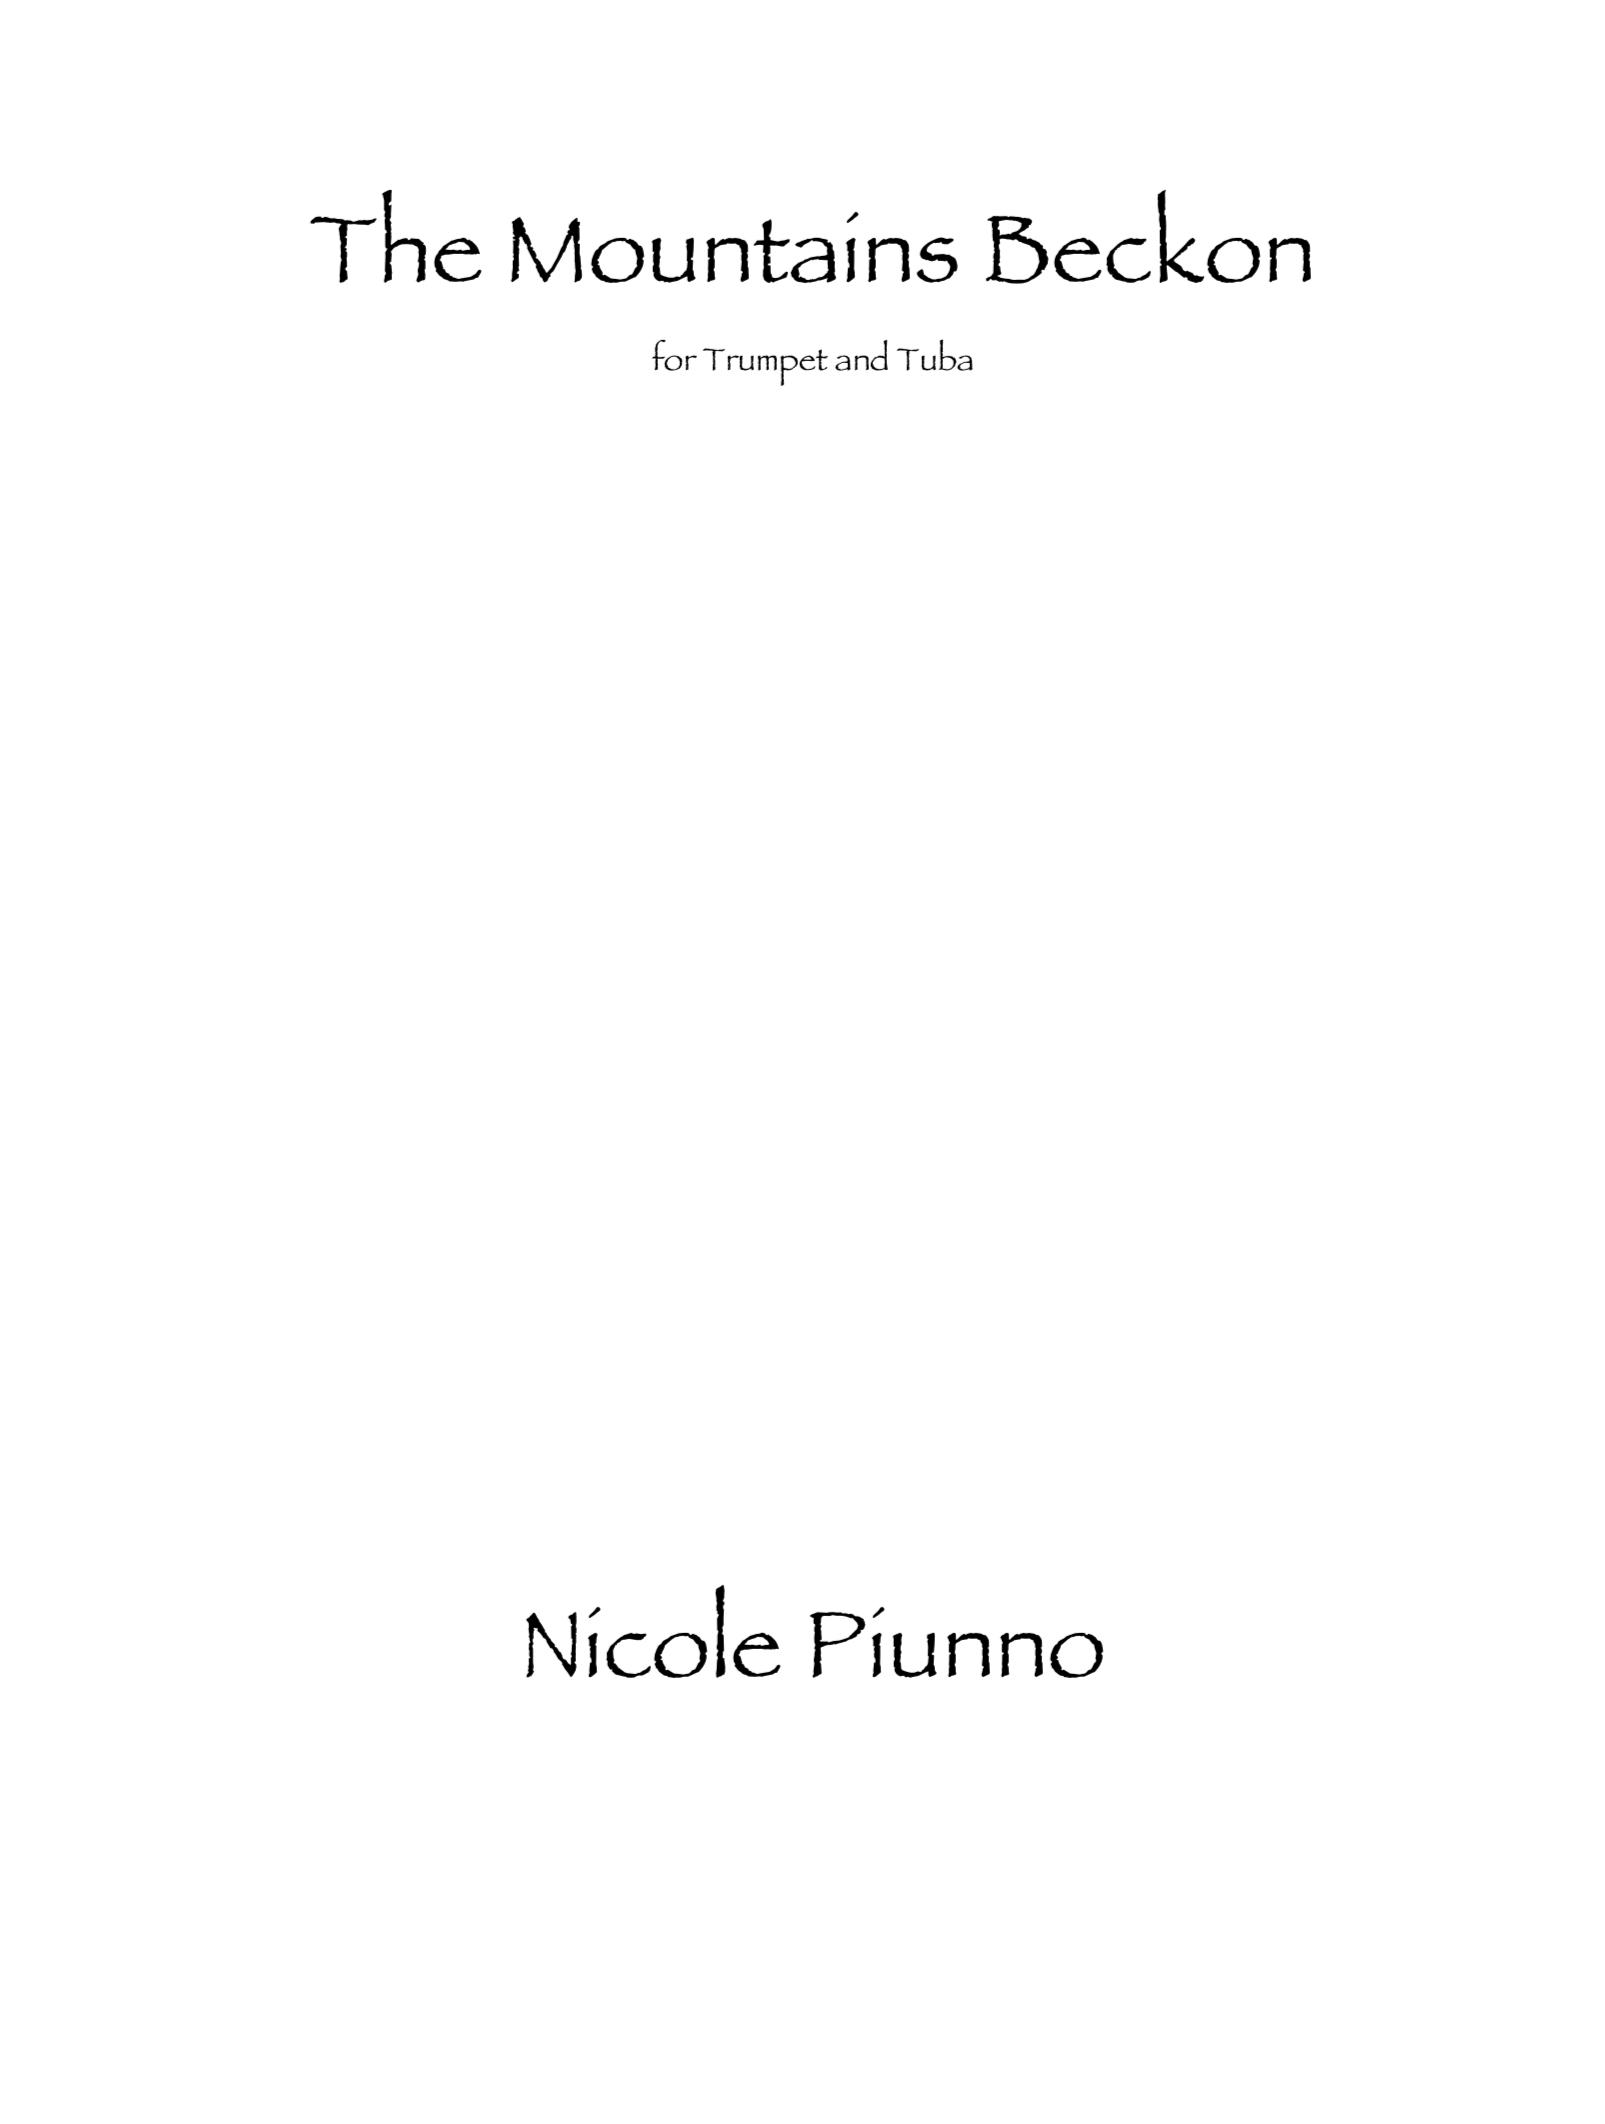 The Mountains Beckon by Nicole Piunno